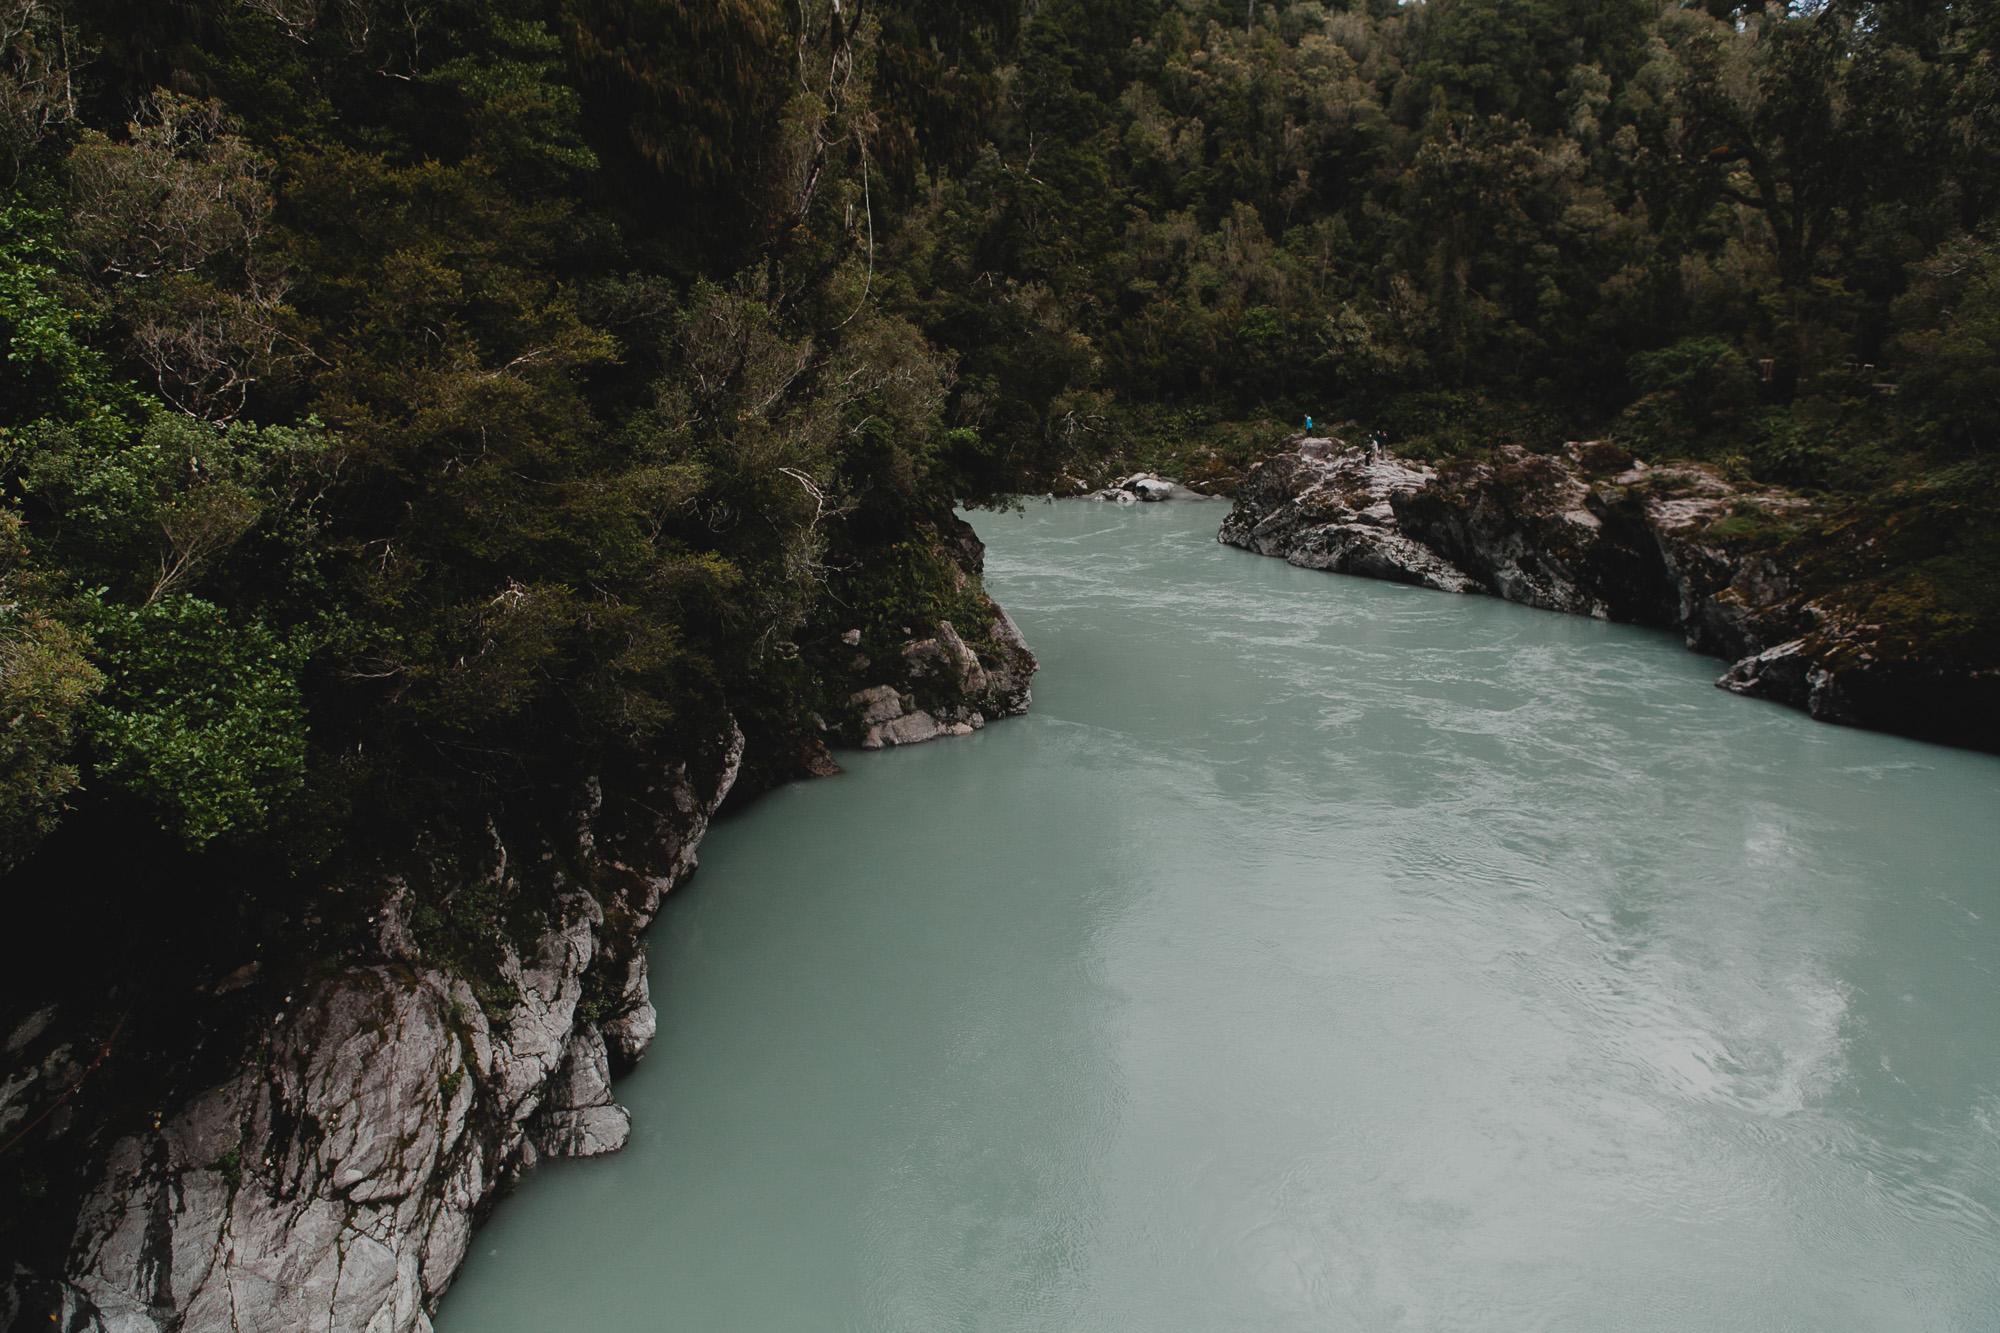 hokitika-gorge-new-zealand-travel-diary-jysla-kay-003